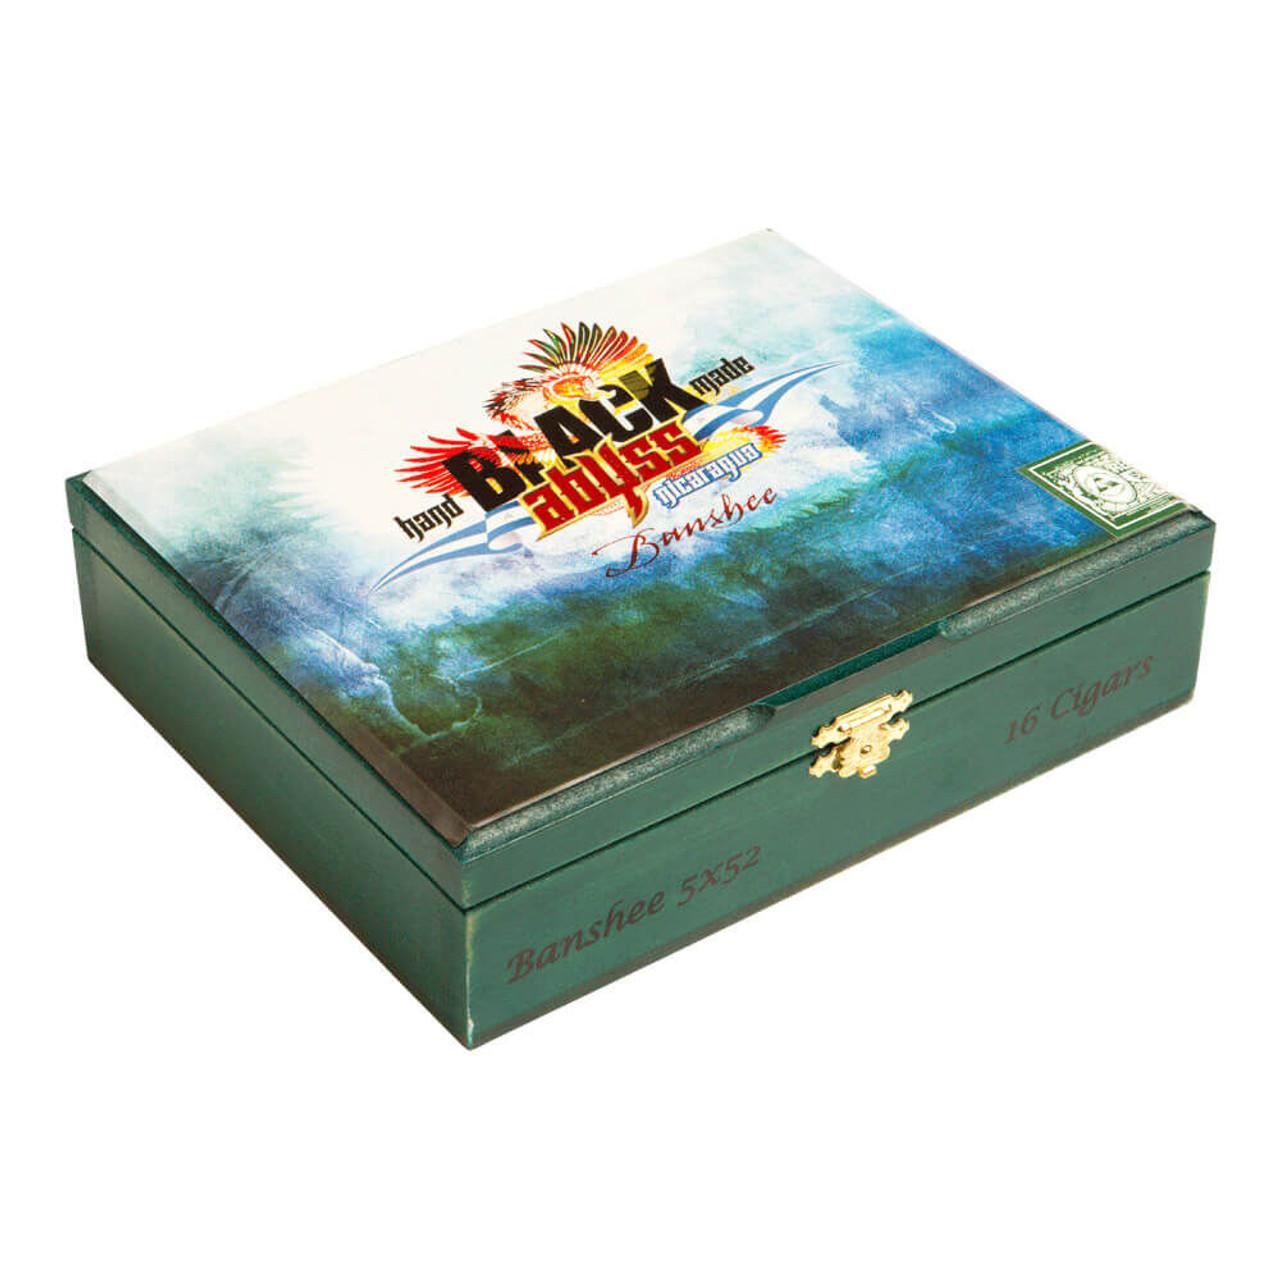 Black Abyss Nicaragua Banshee Cigars - 5 x 52 (Box of 16)